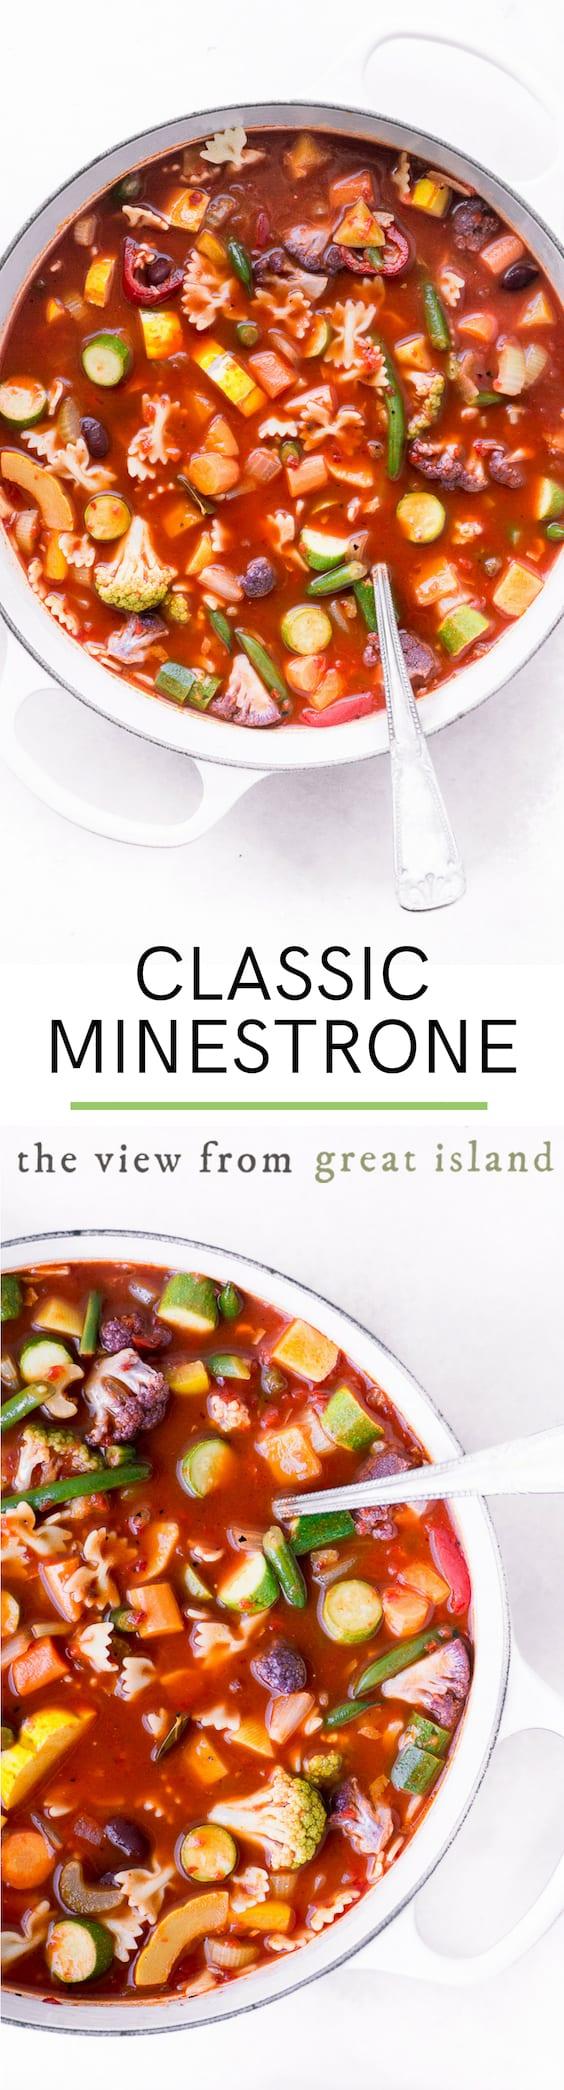 classic minestrone pin